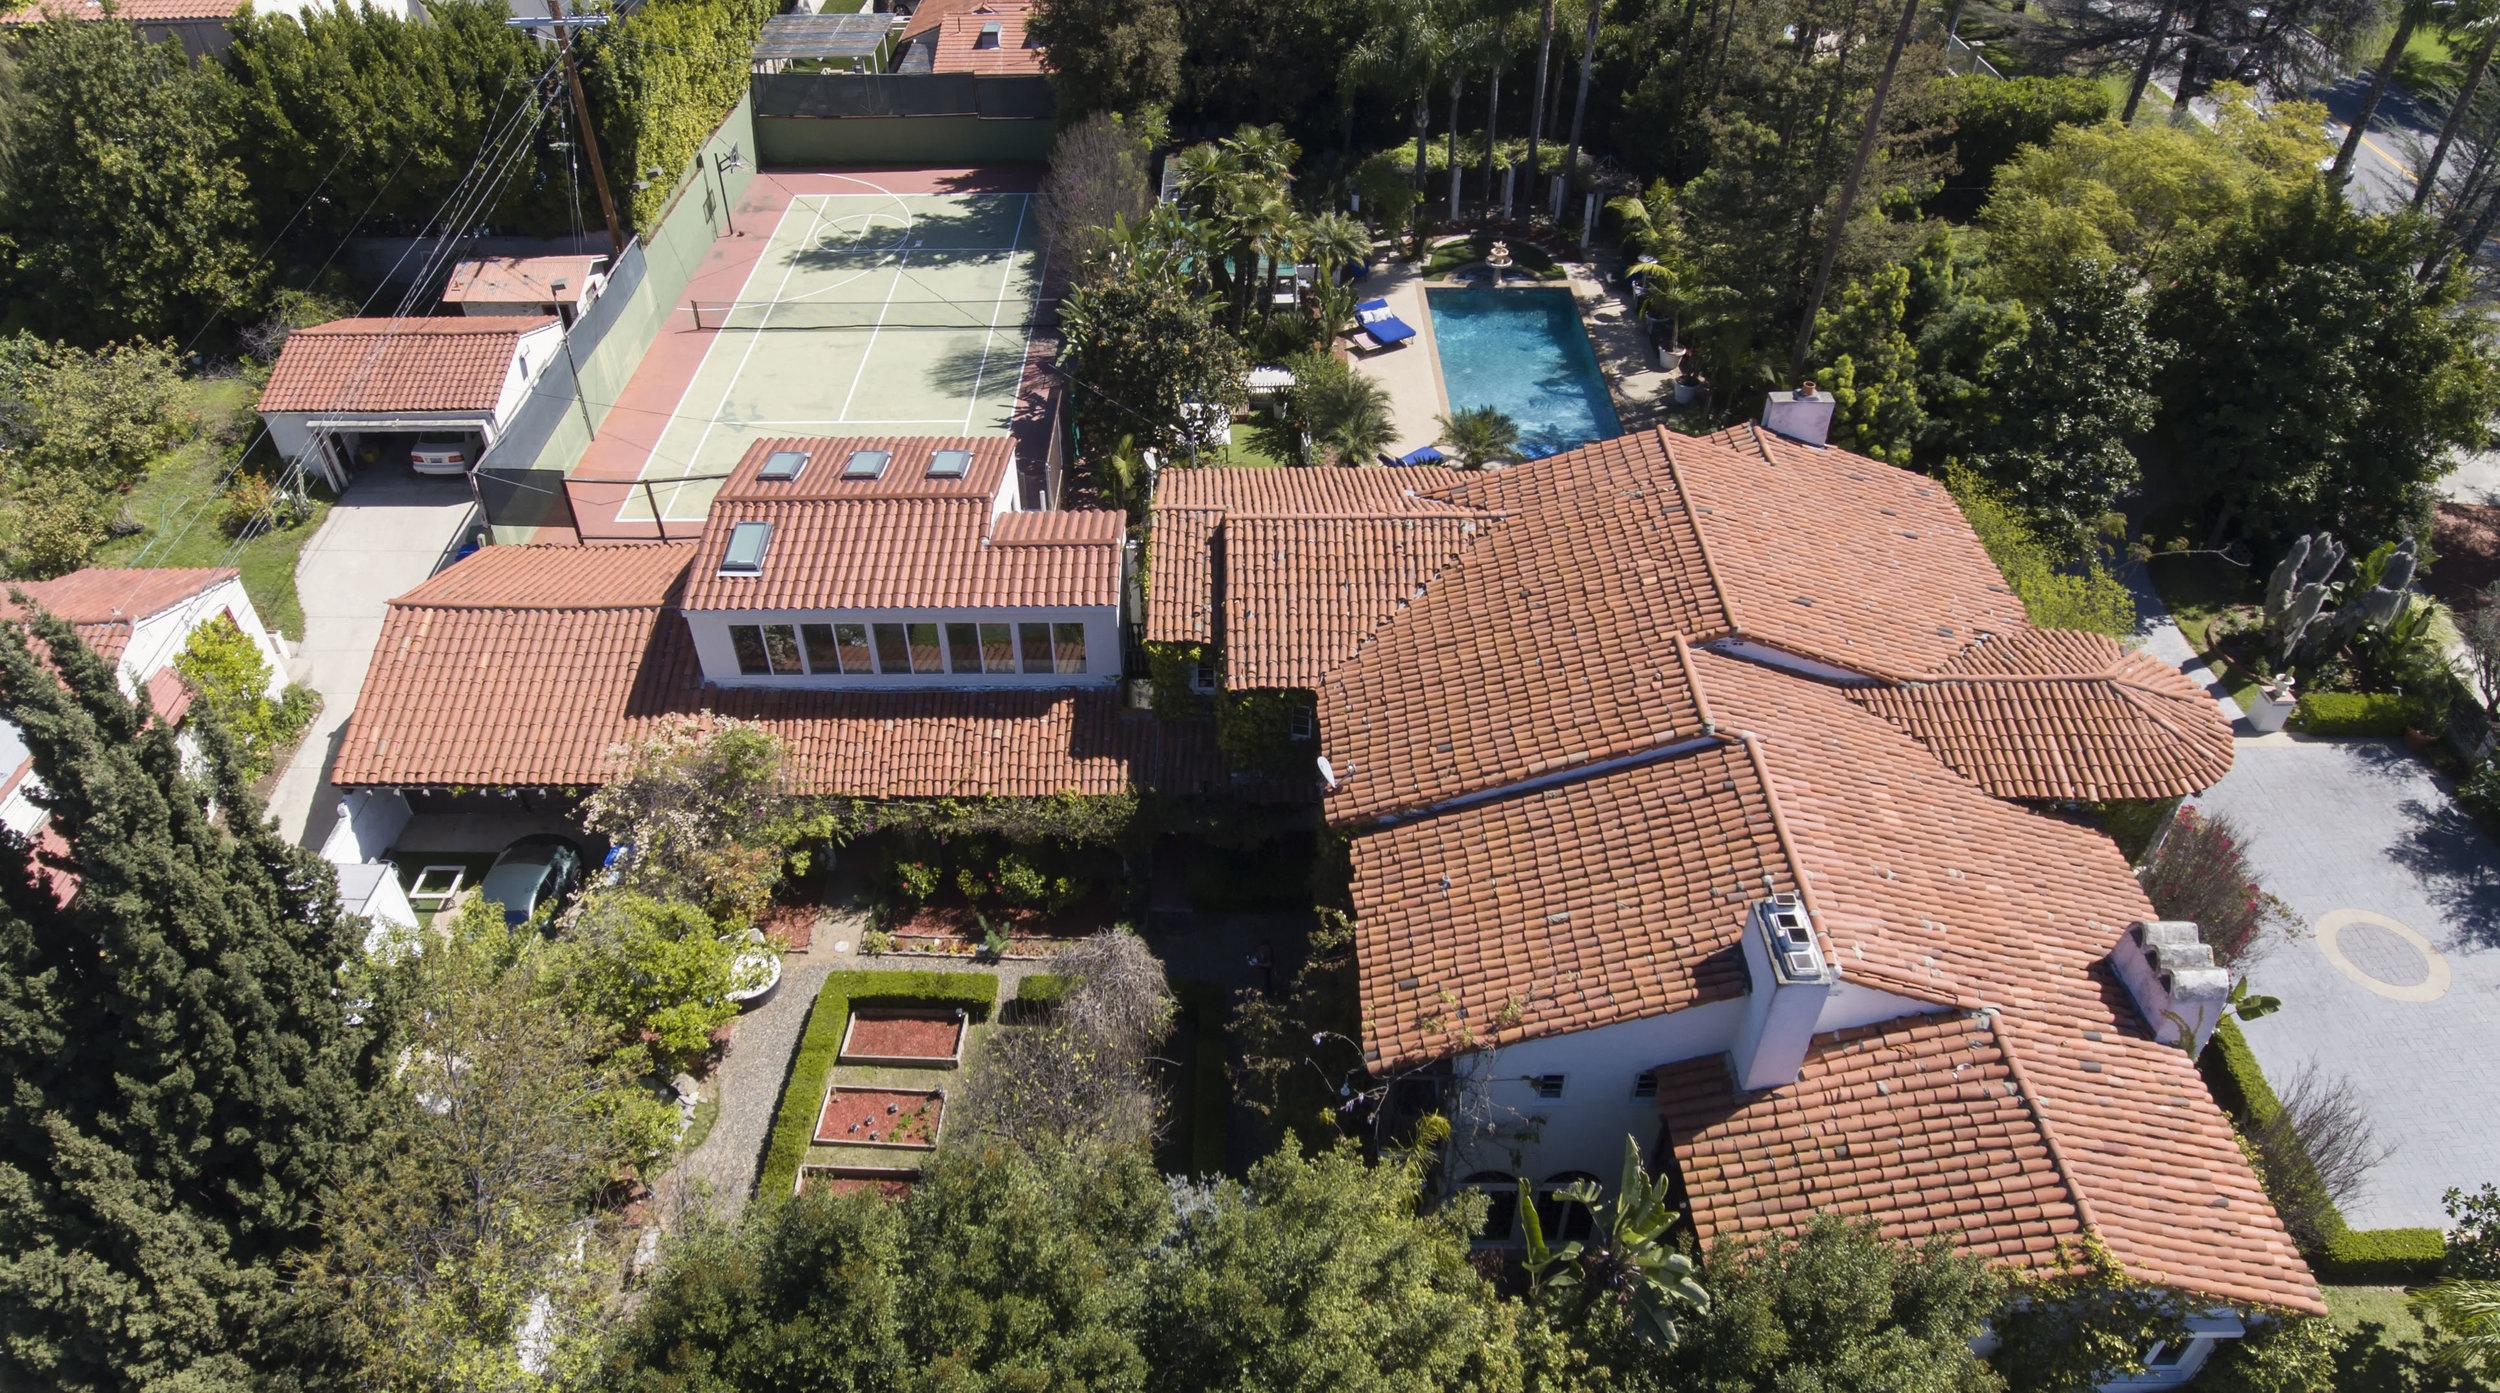 033 Aerial 006 Pool 4915 Los Feliz For Sale Los Angeles Lease The Malibu Life Team Luxury Real Estate.jpg